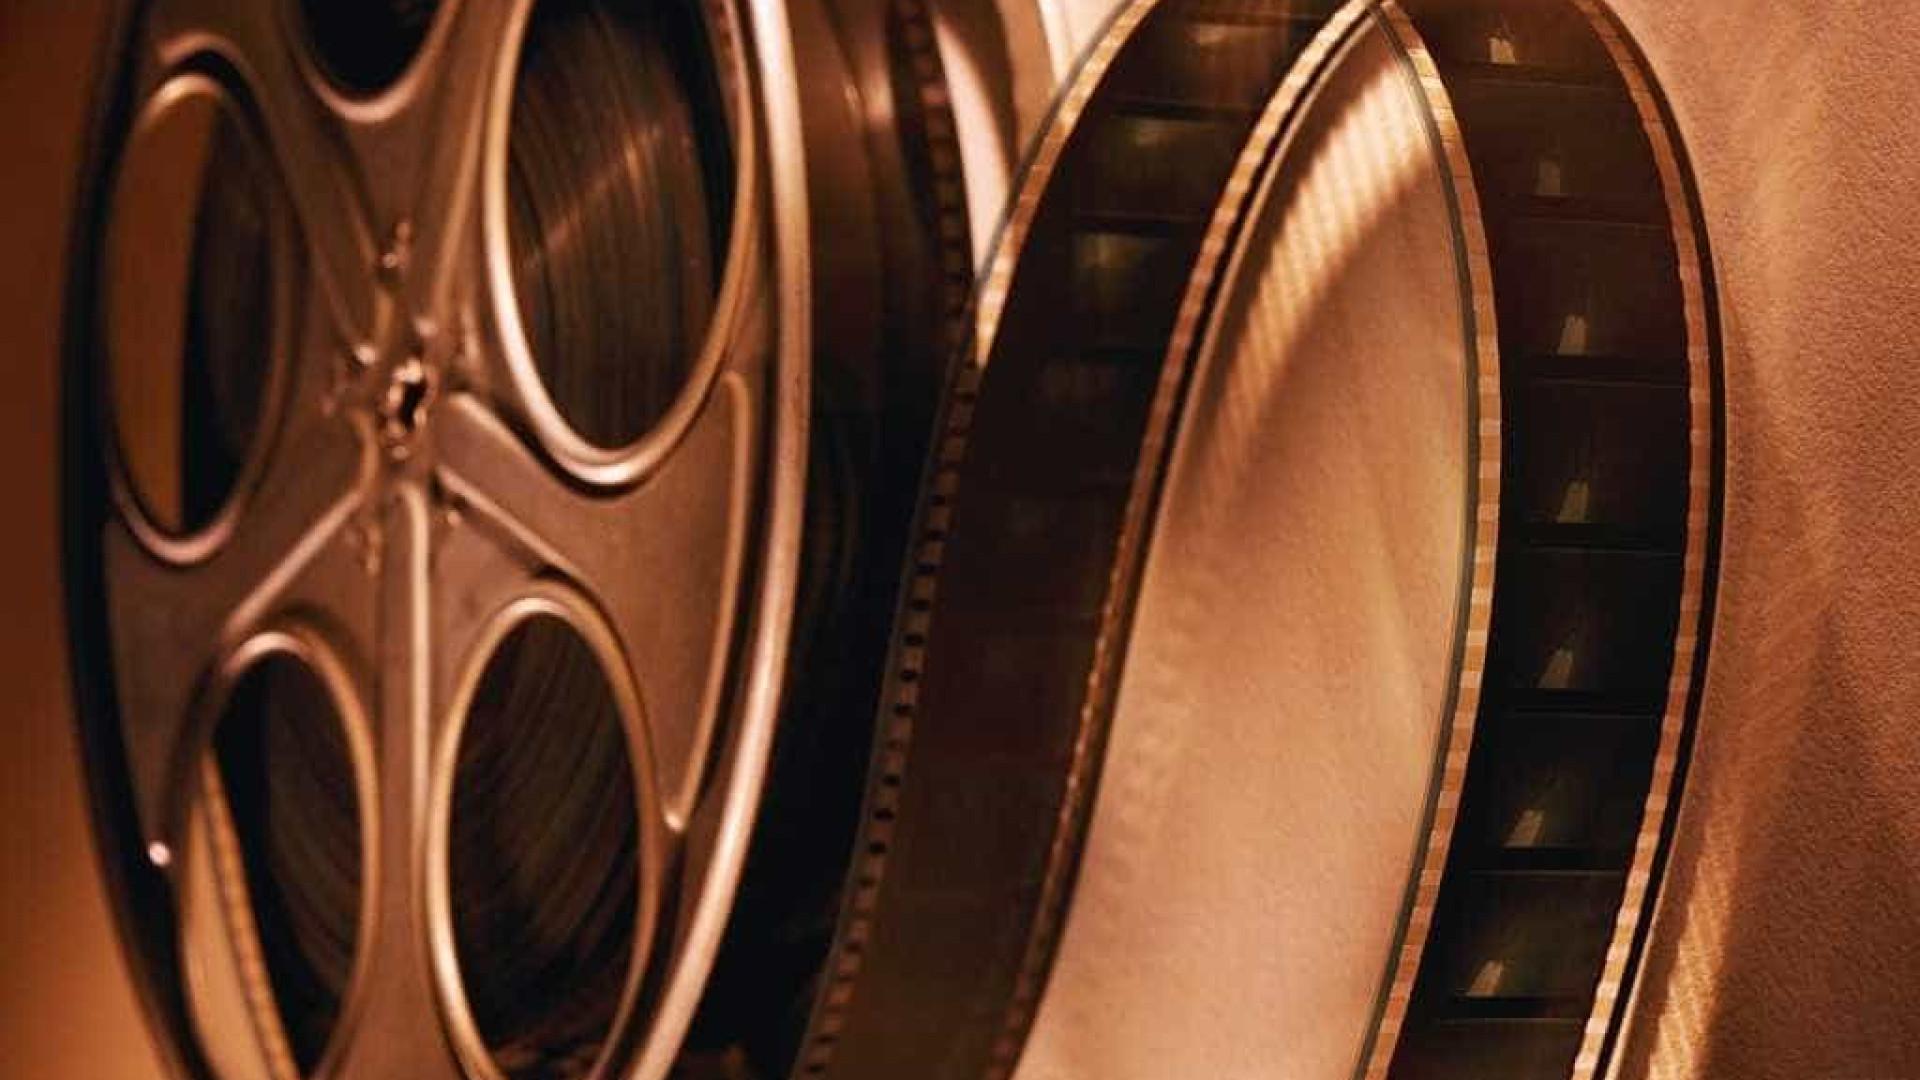 Património cinematográfico de Viseu dos anos 30 'resgatado' para DVD